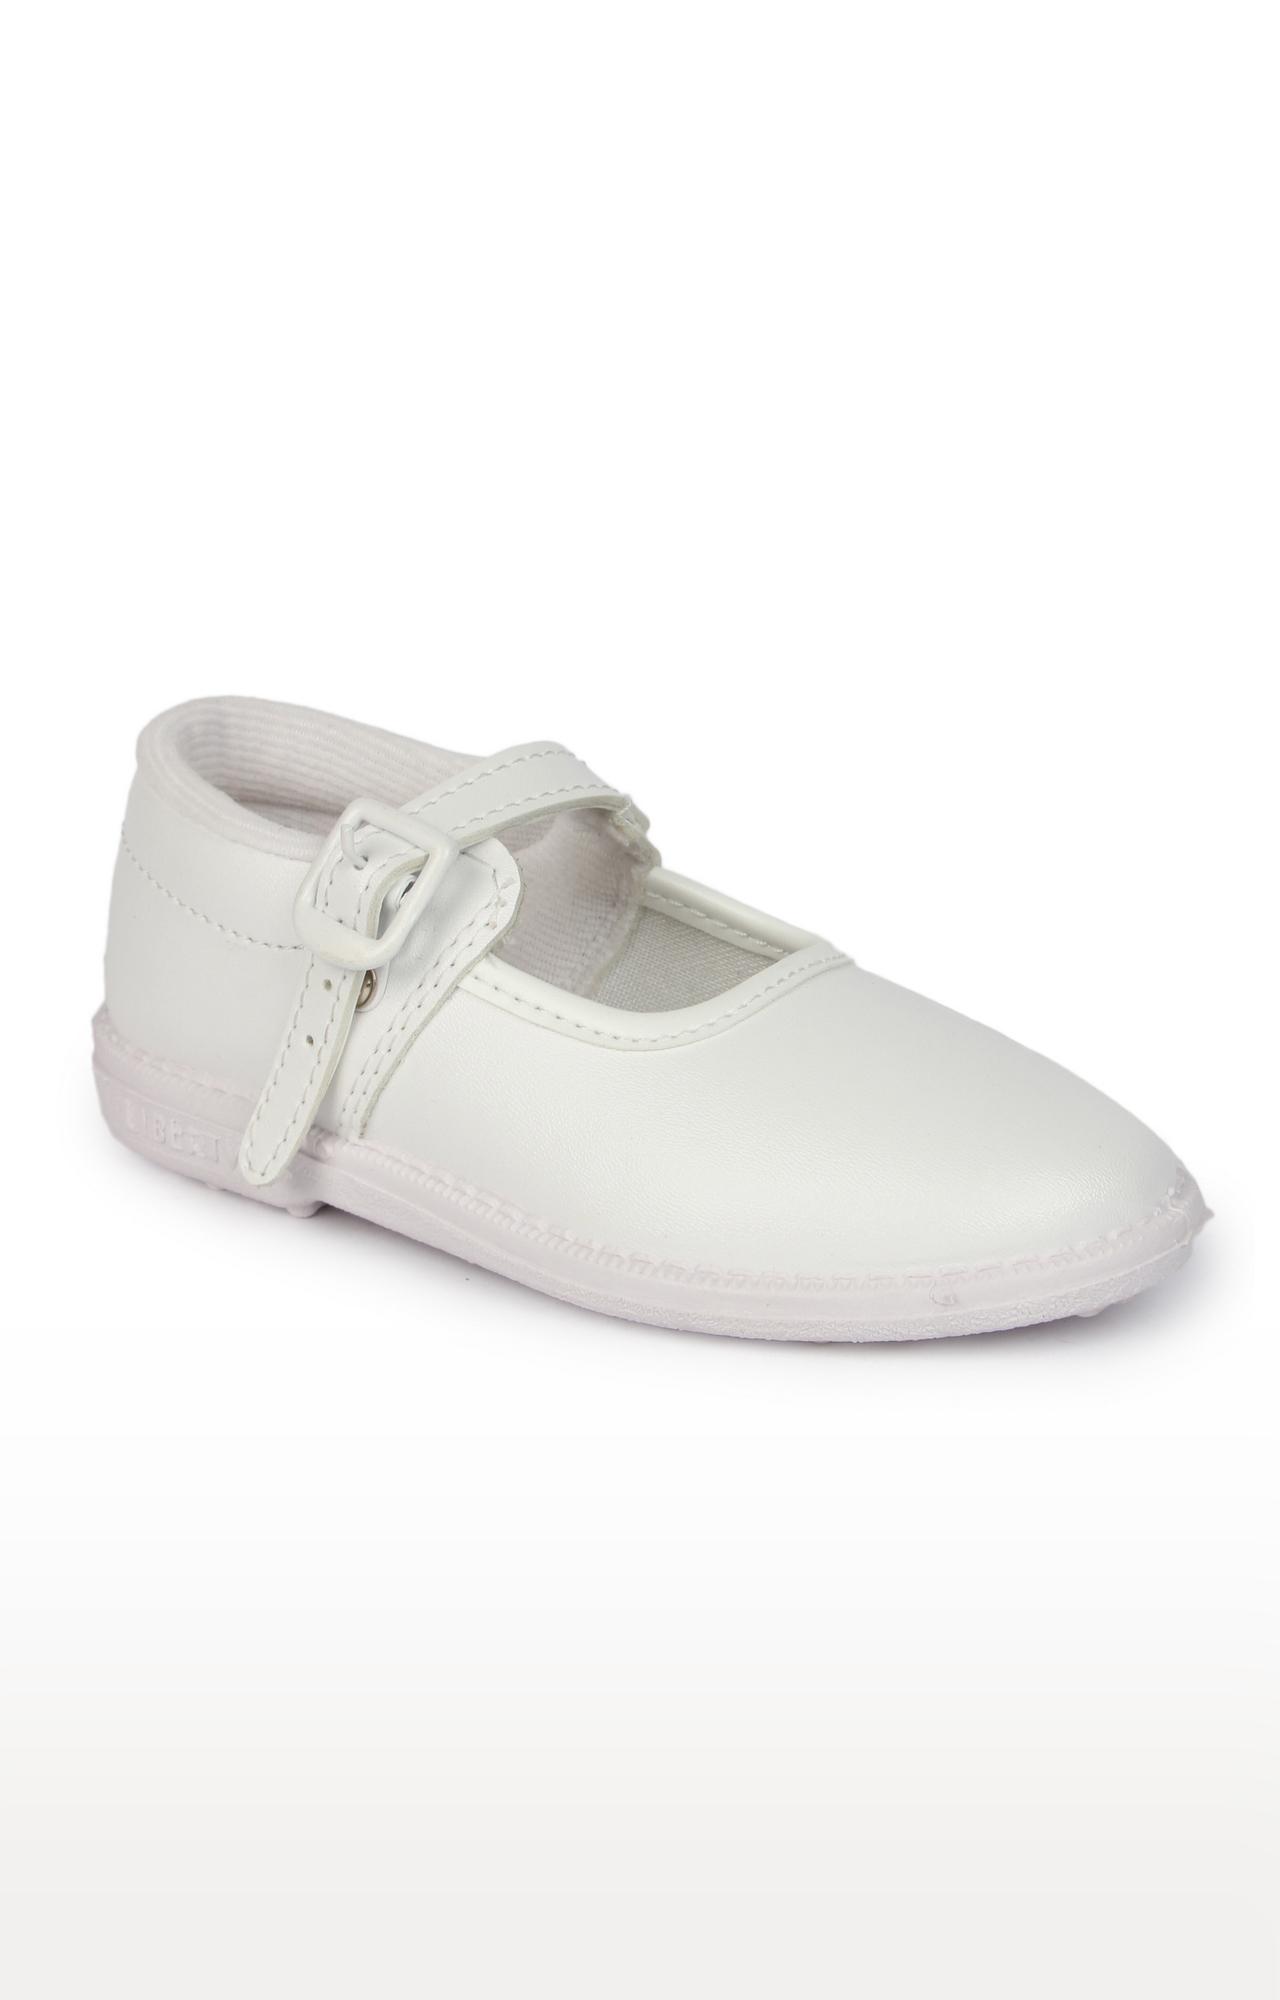 Liberty | Prefect by Liberty White School Shoes